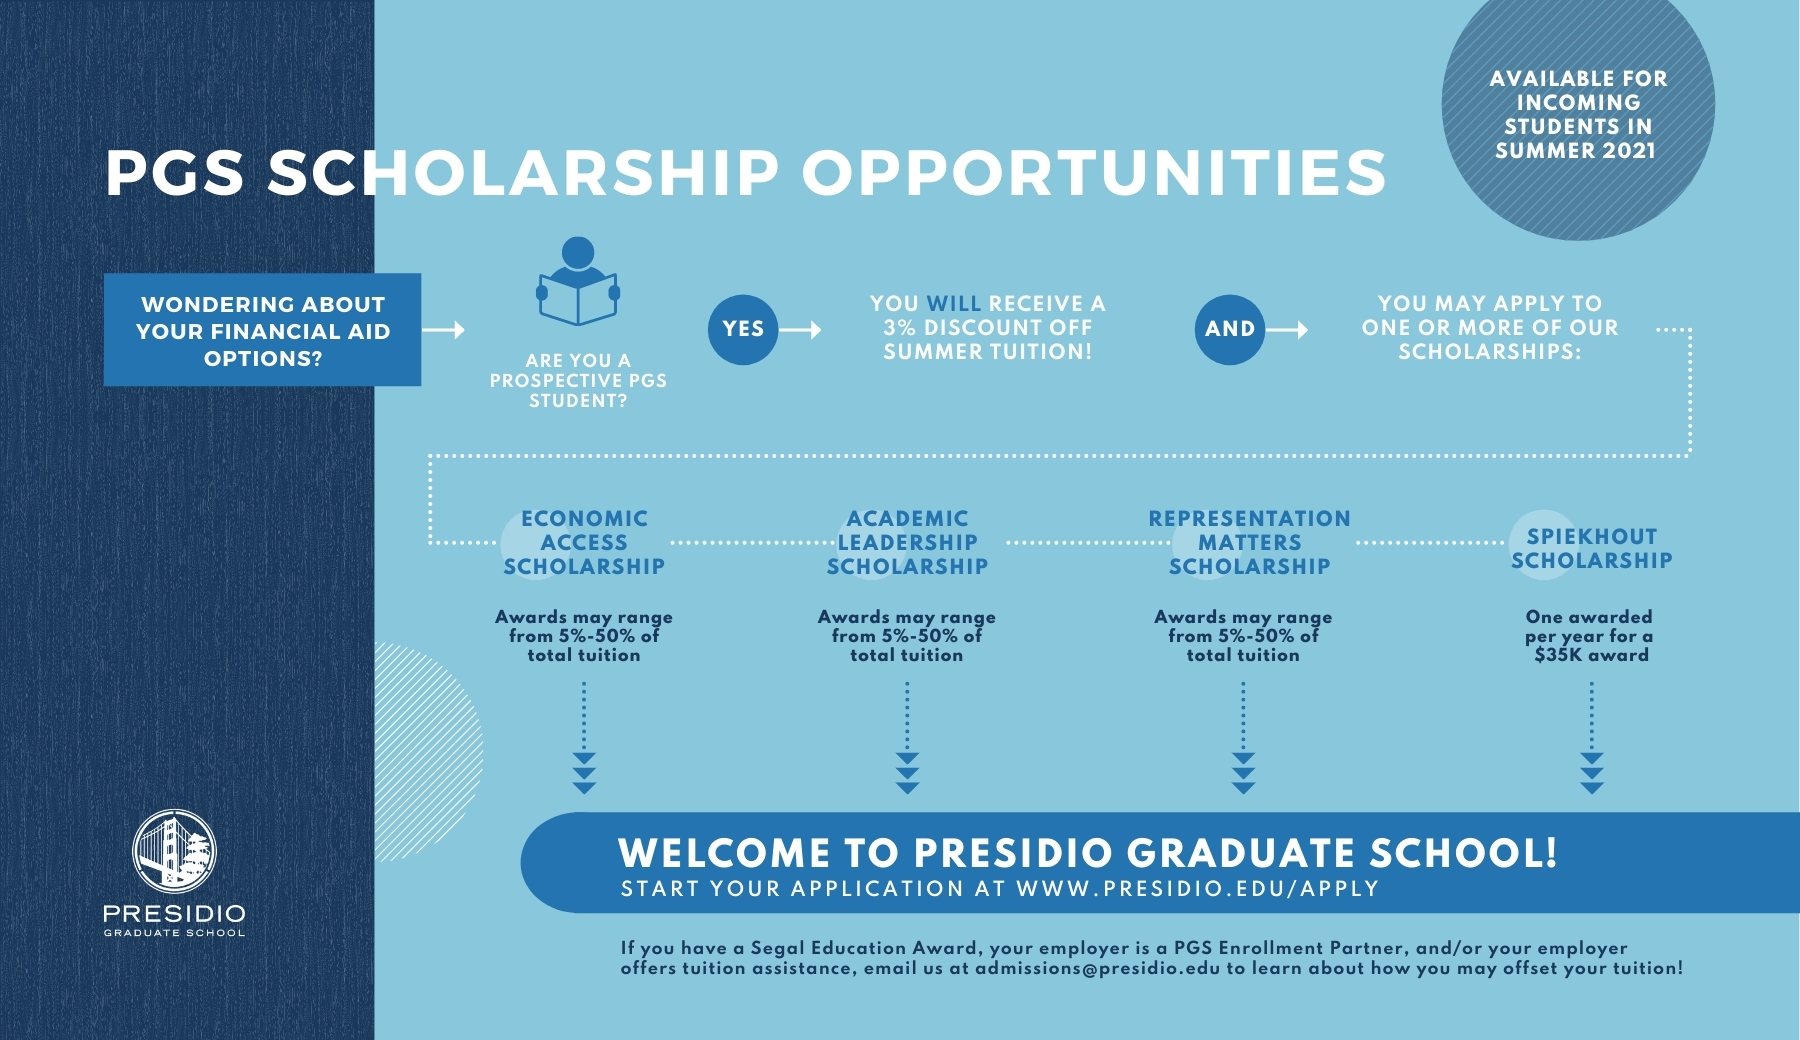 Presidio Scholarship Opportunities